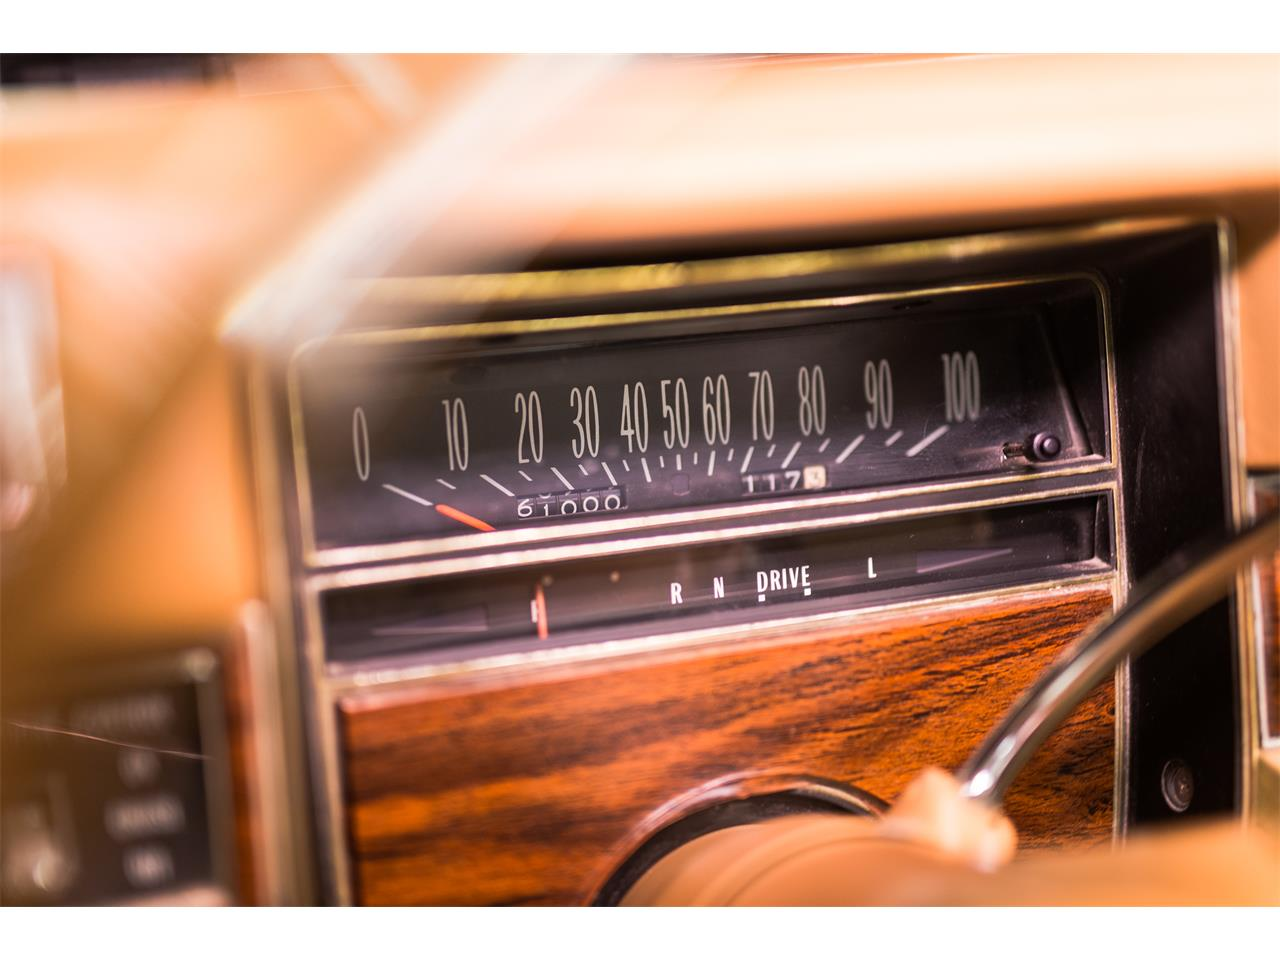 Large Picture of '76 Cadillac Eldorado - $37,500.00 - OAO6